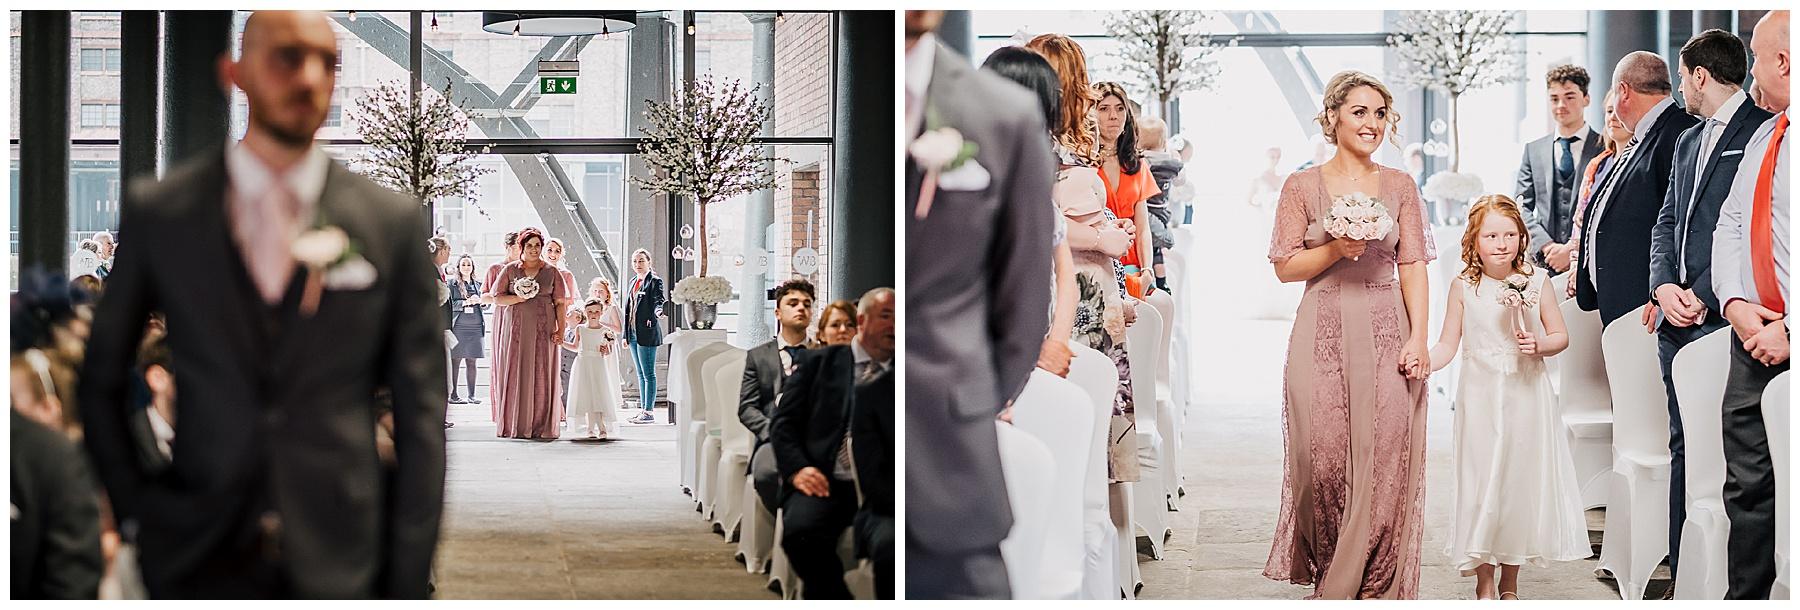 City Wedding Lushness at The Titanic Hotel